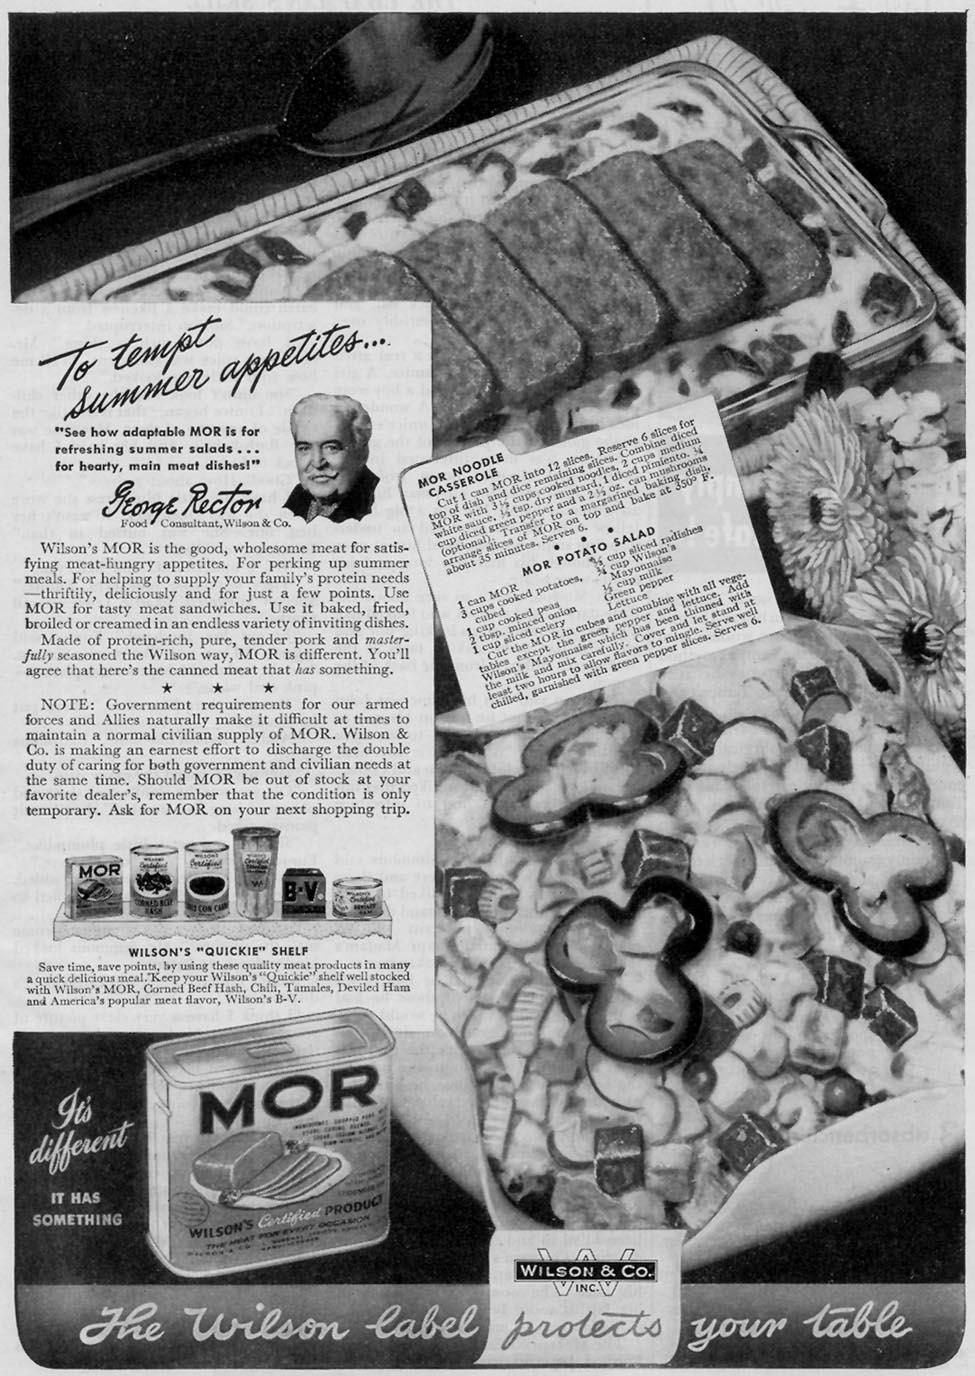 WILSON'S MOR WOMAN'S DAY 07/01/1945 p. 55